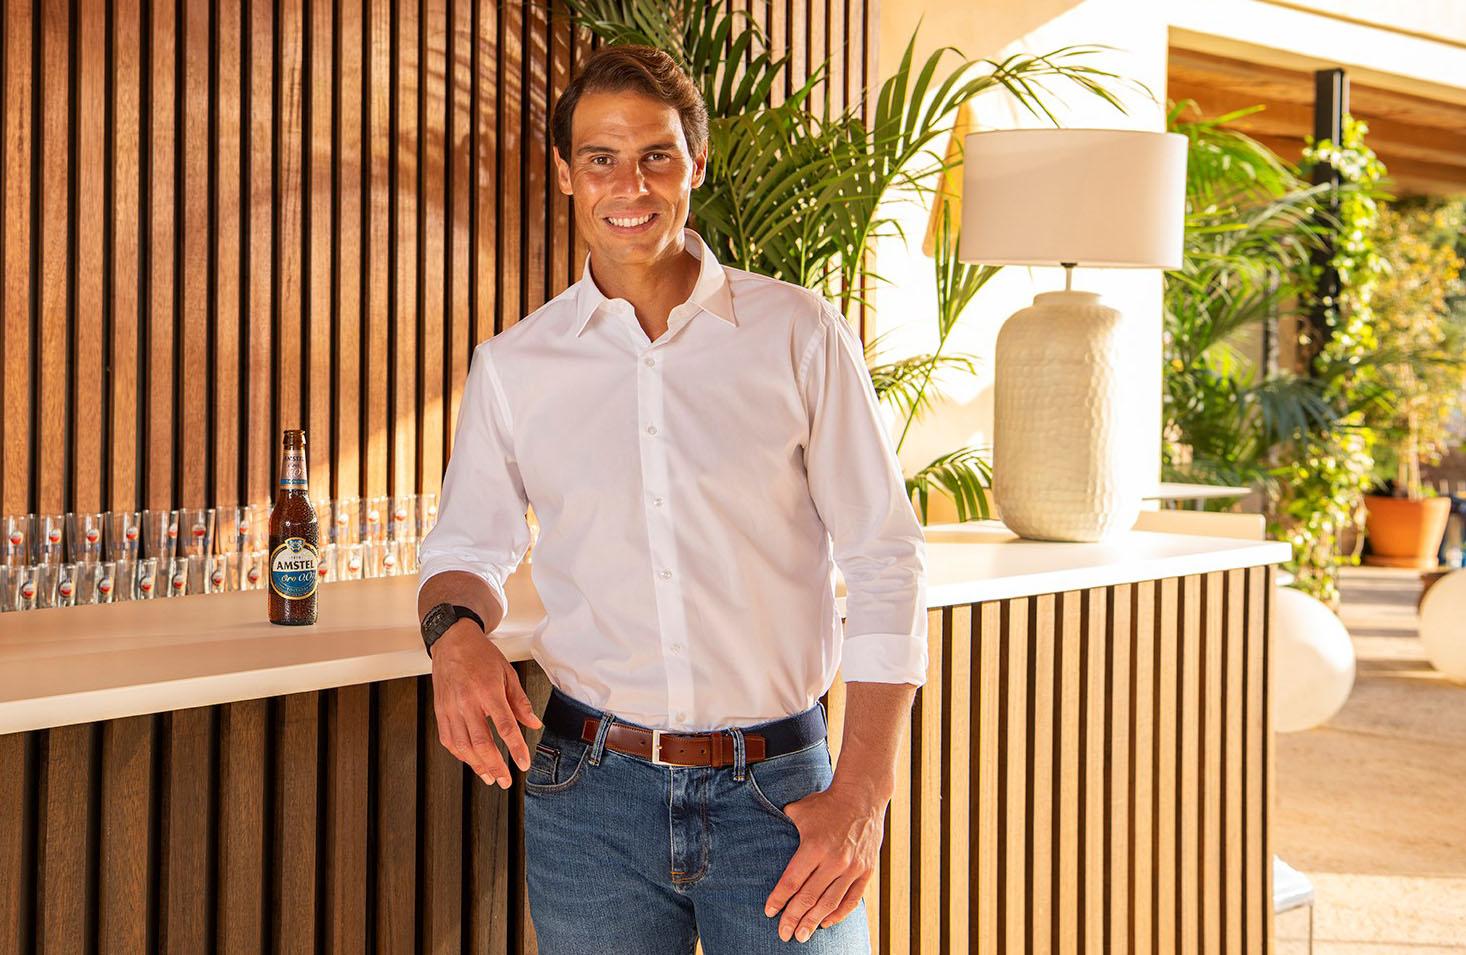 Rafa Nadal, nuevo embajador de Amstel Oro 0,0